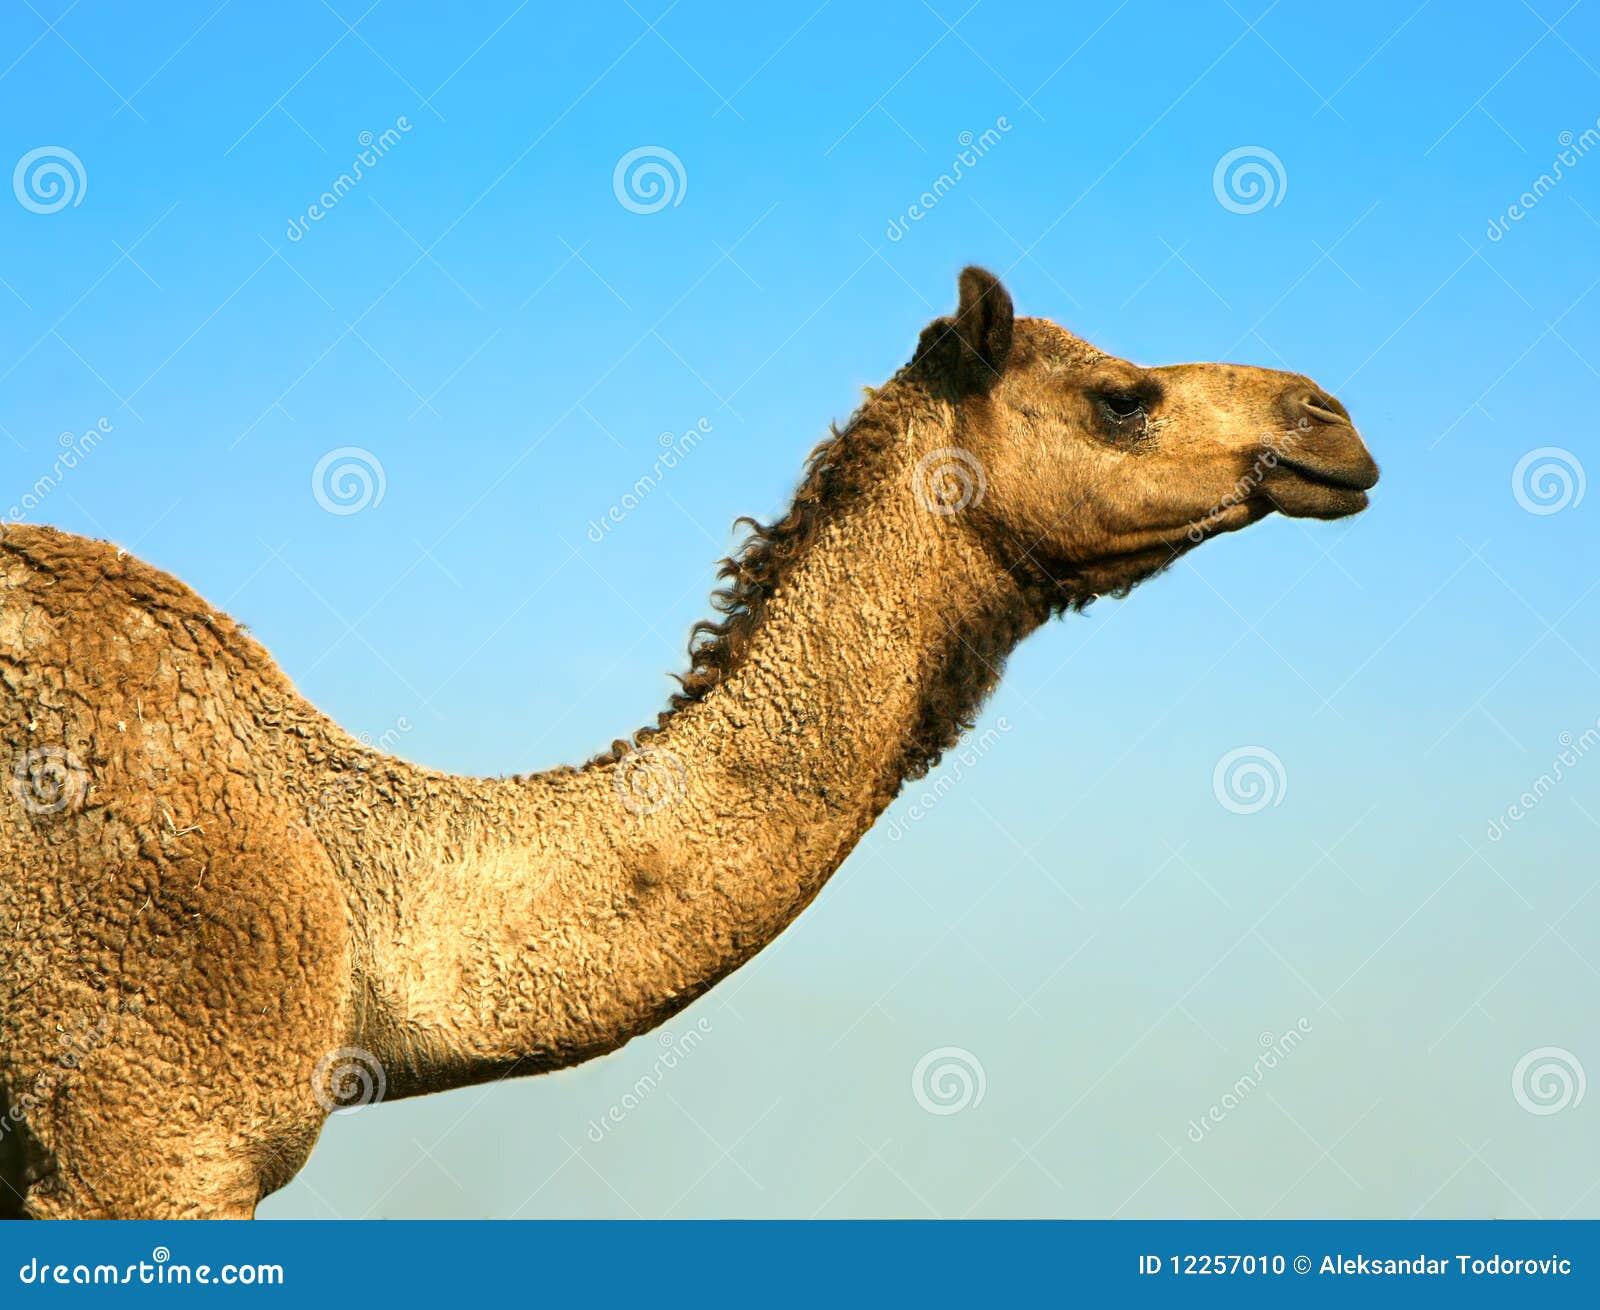 Head of a camel on safari - desert